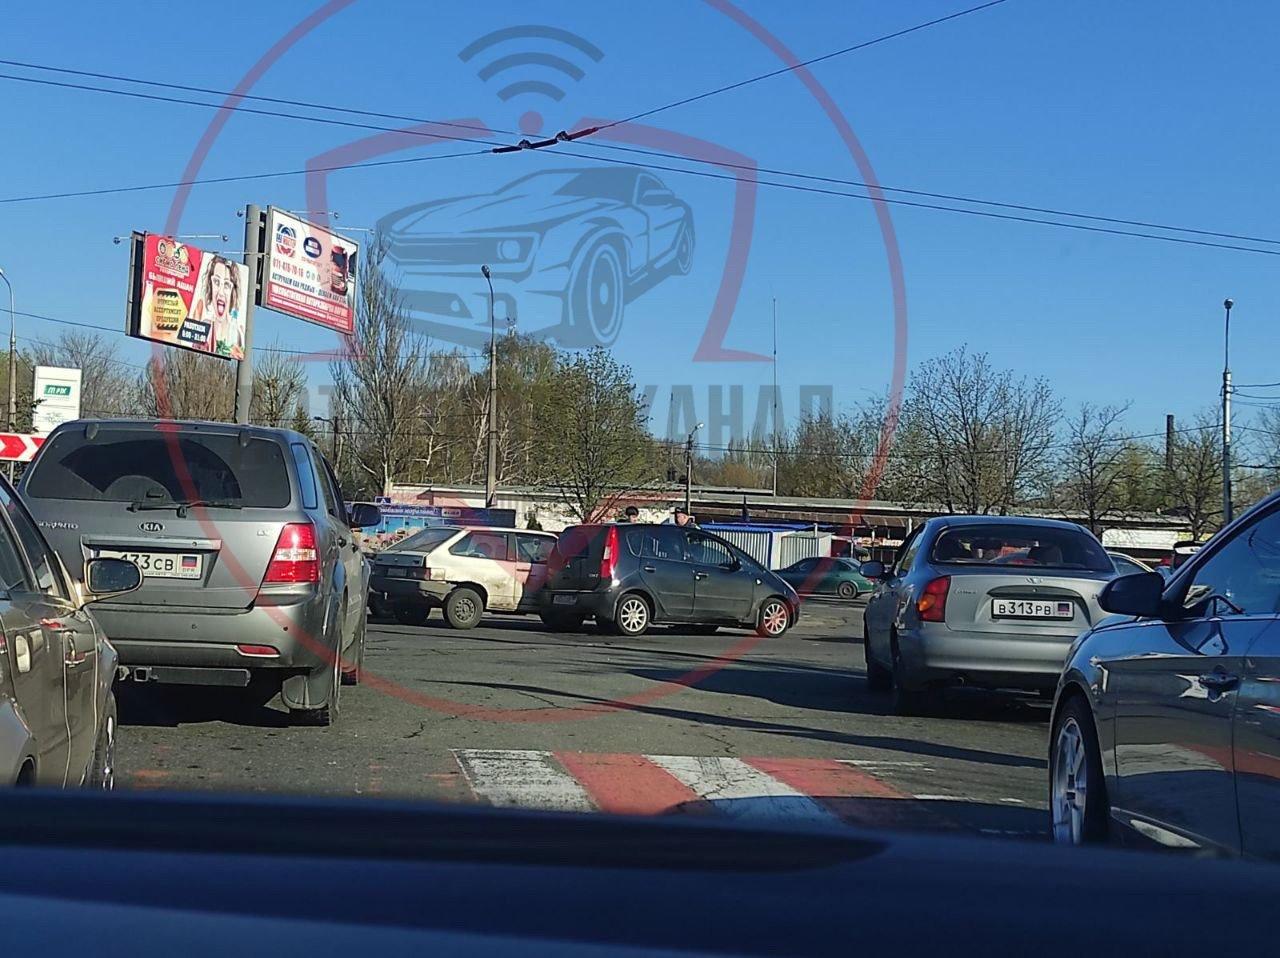 ДТП в Донецке: движение на кольце у мотеля парализовано,- ФОТО, фото-1